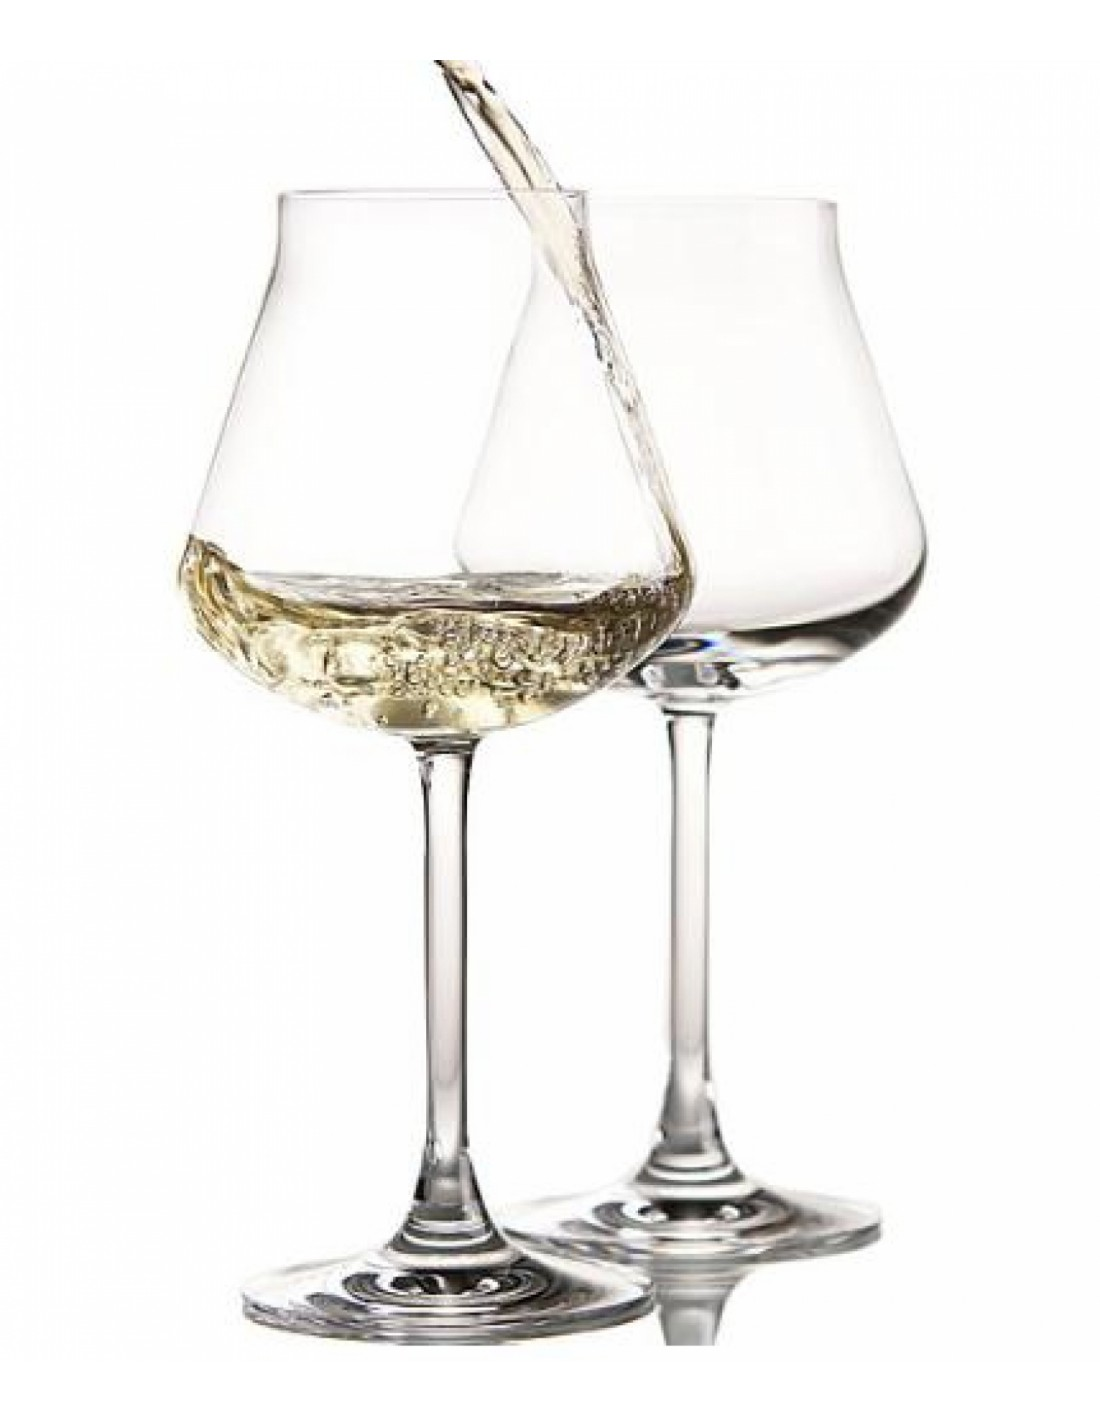 Ch teau baccarat verre vin blanc x 2 r alis en cristal for Verre 51 piscine design tabac